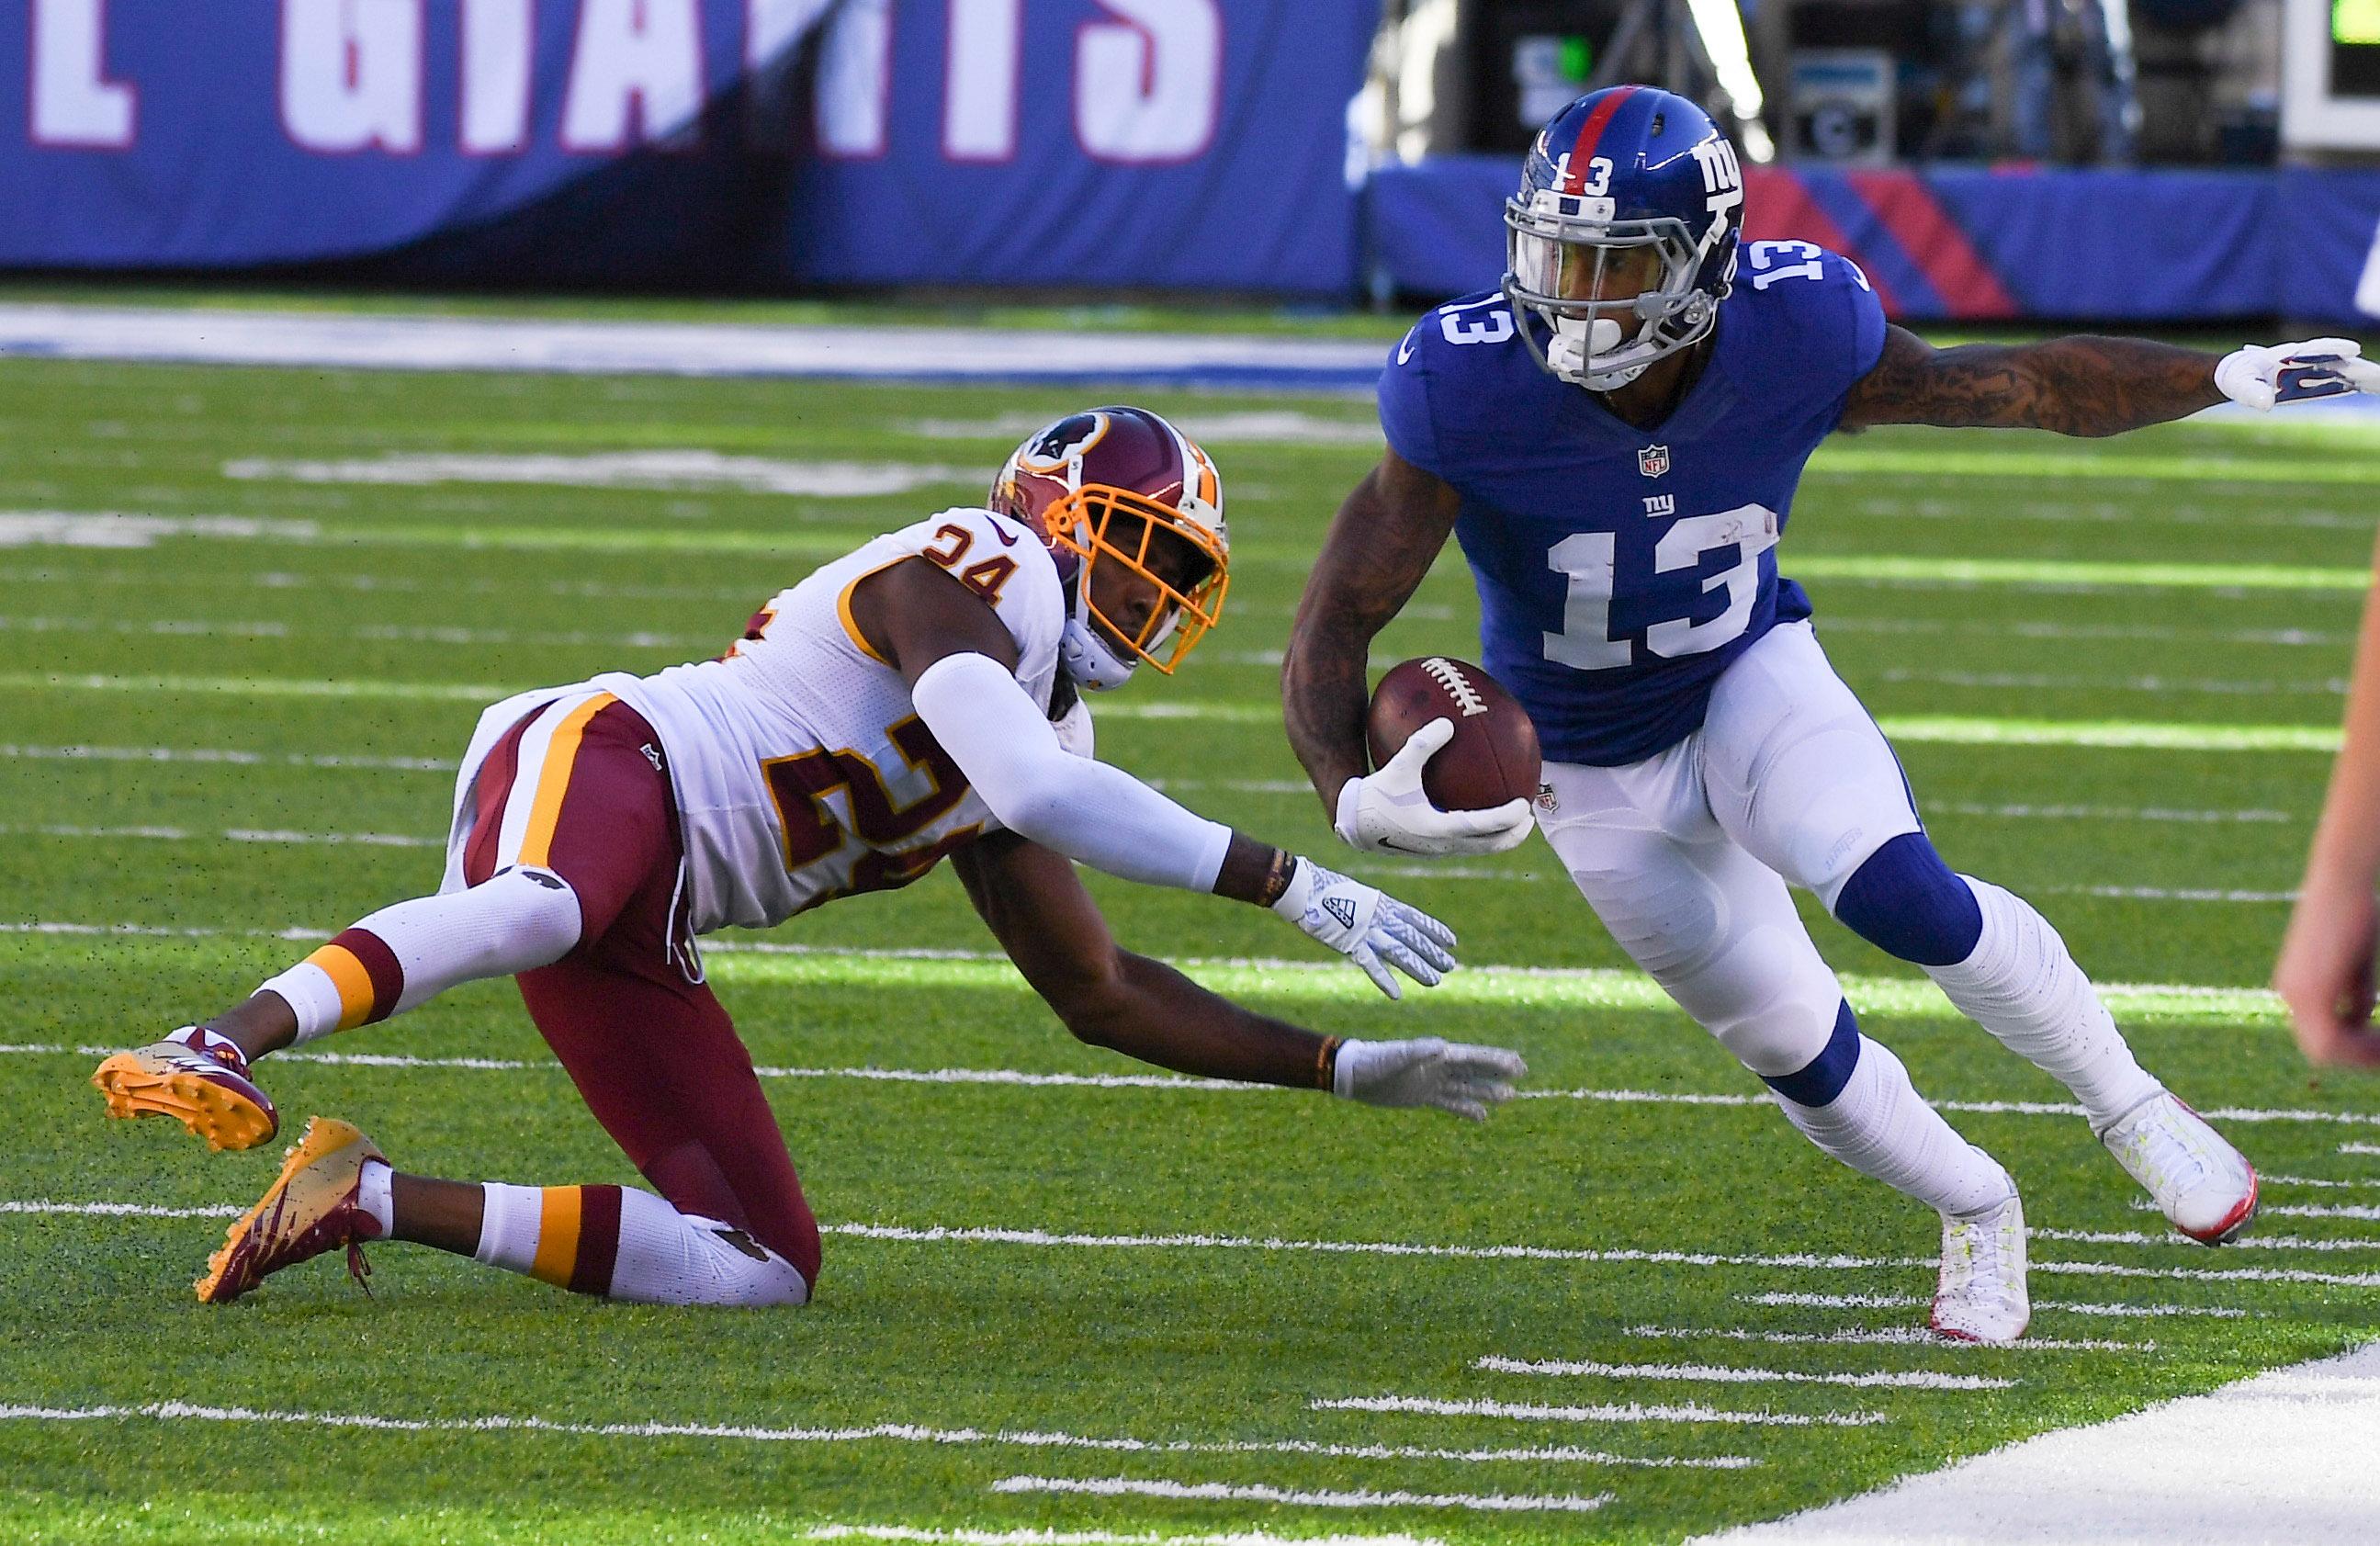 NFL: Washington Redskins at New York Giants